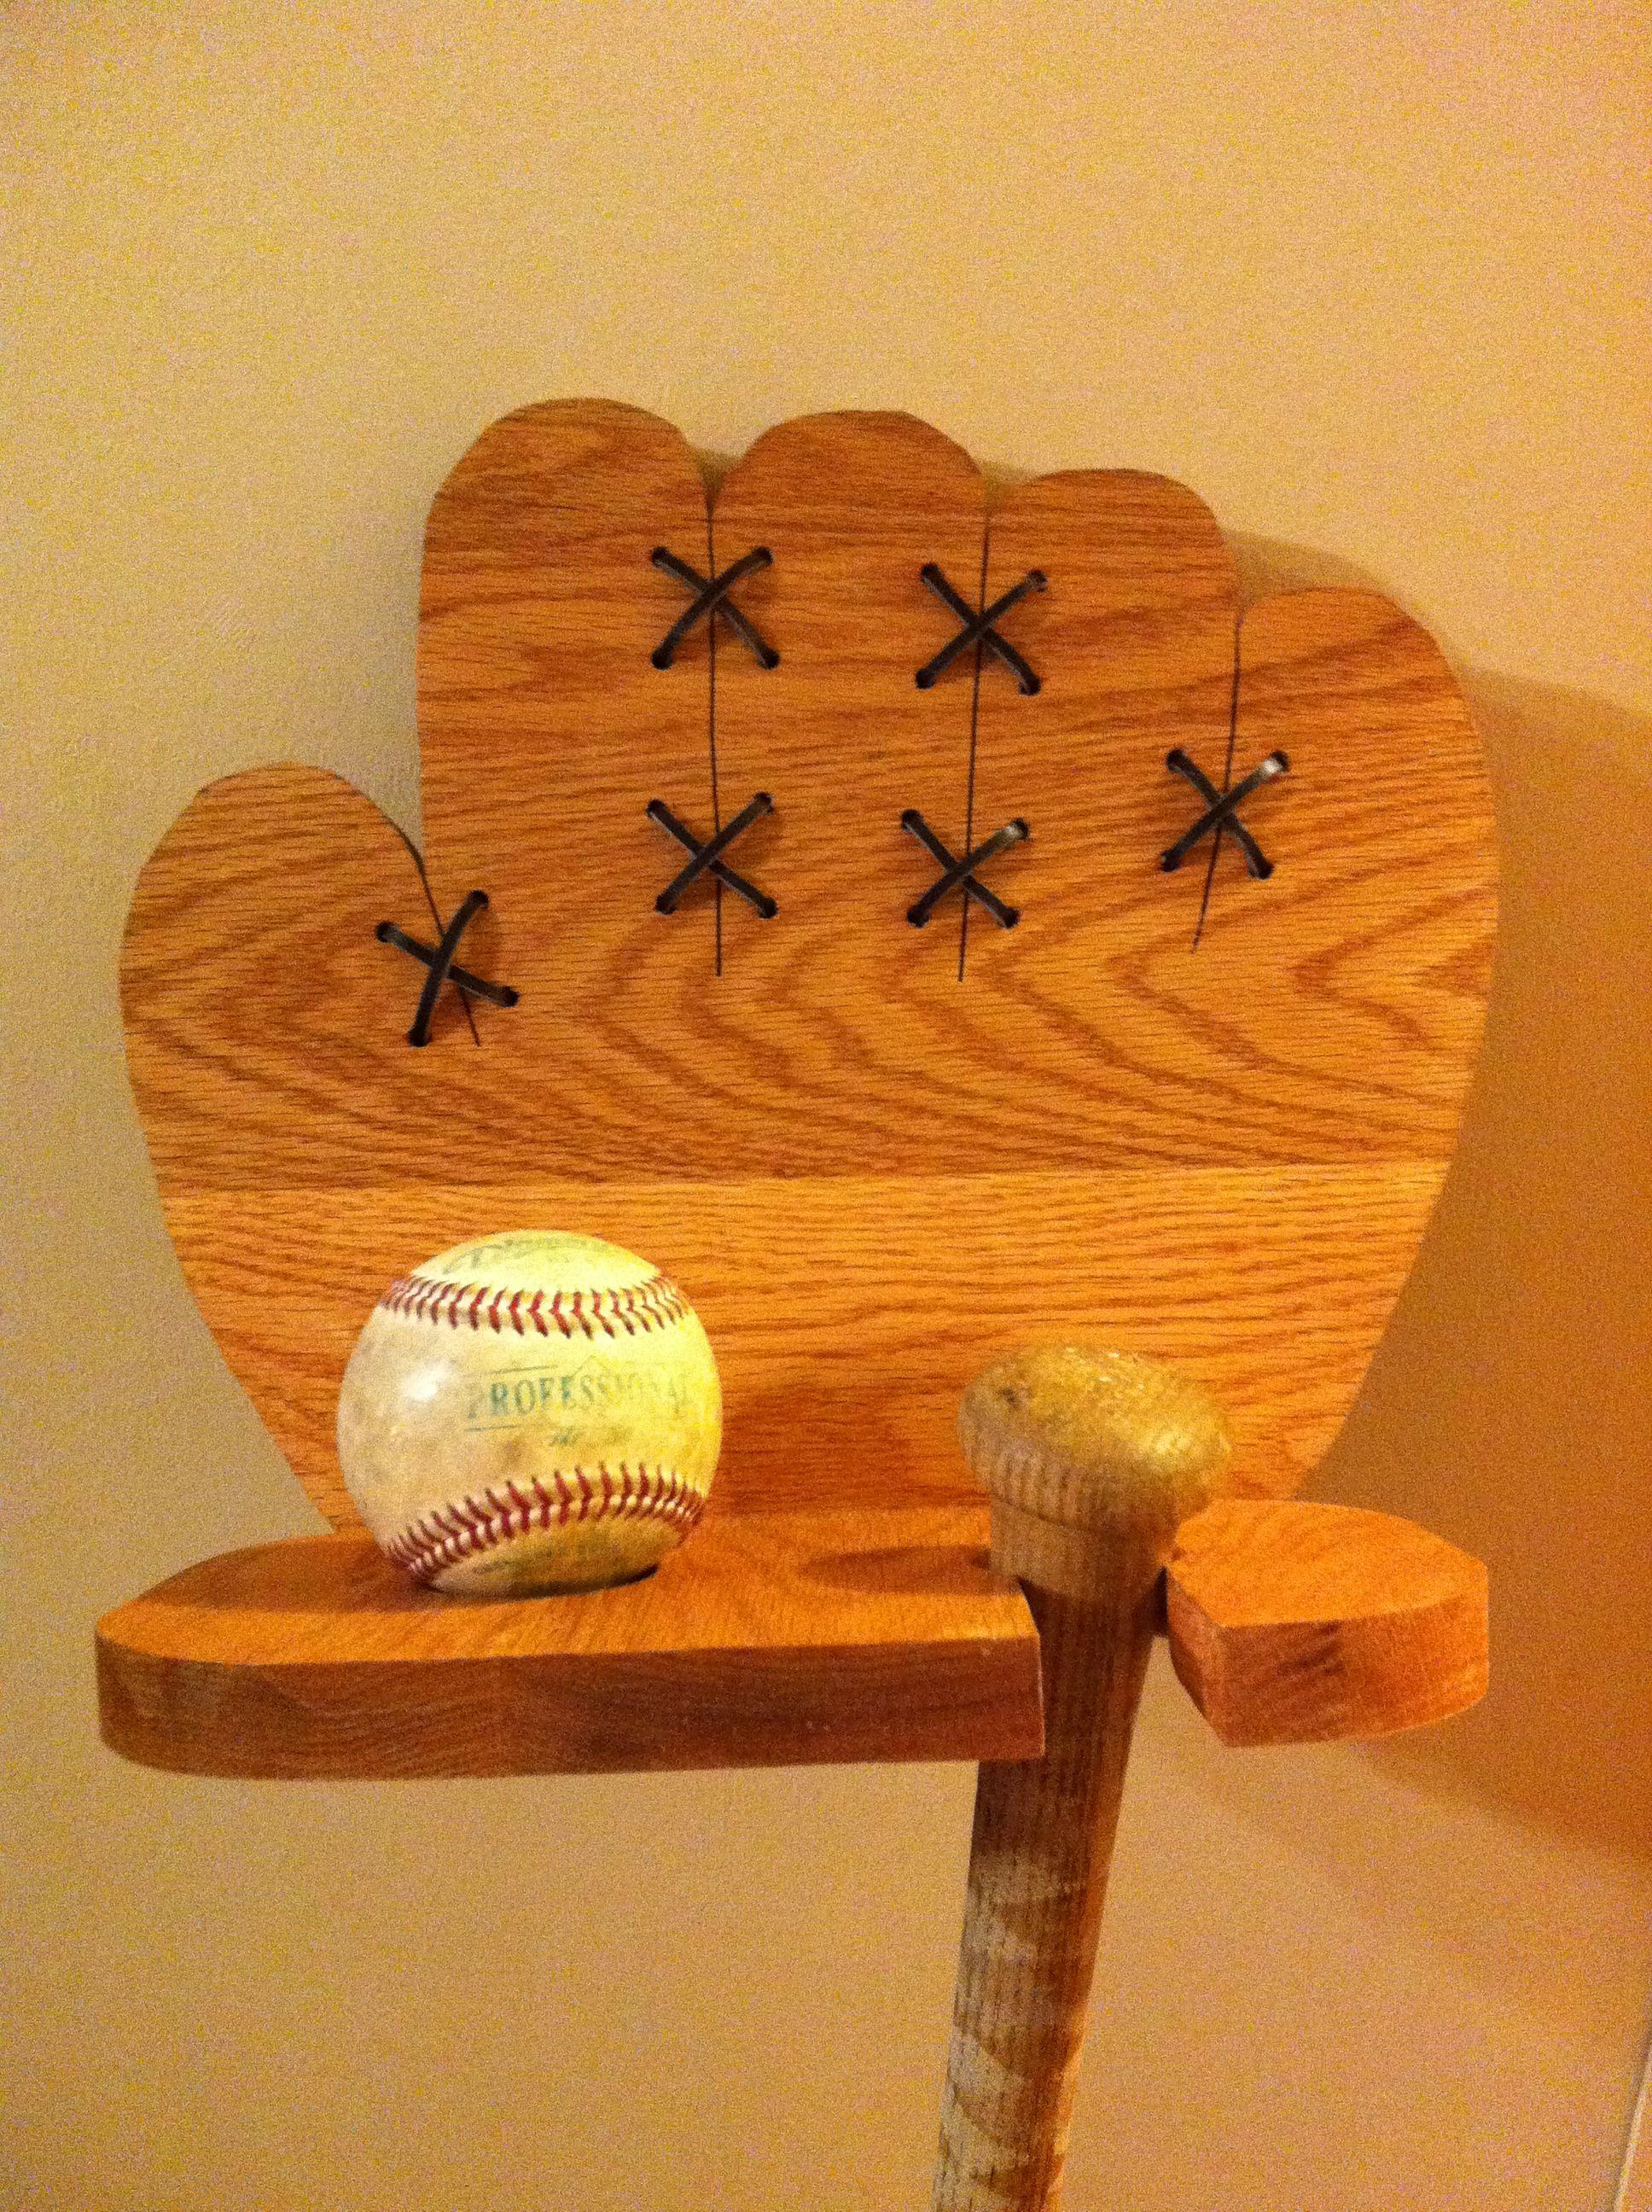 Ball And Bat Holder Sports Stuff In 2018 Pinterest Wood Wood